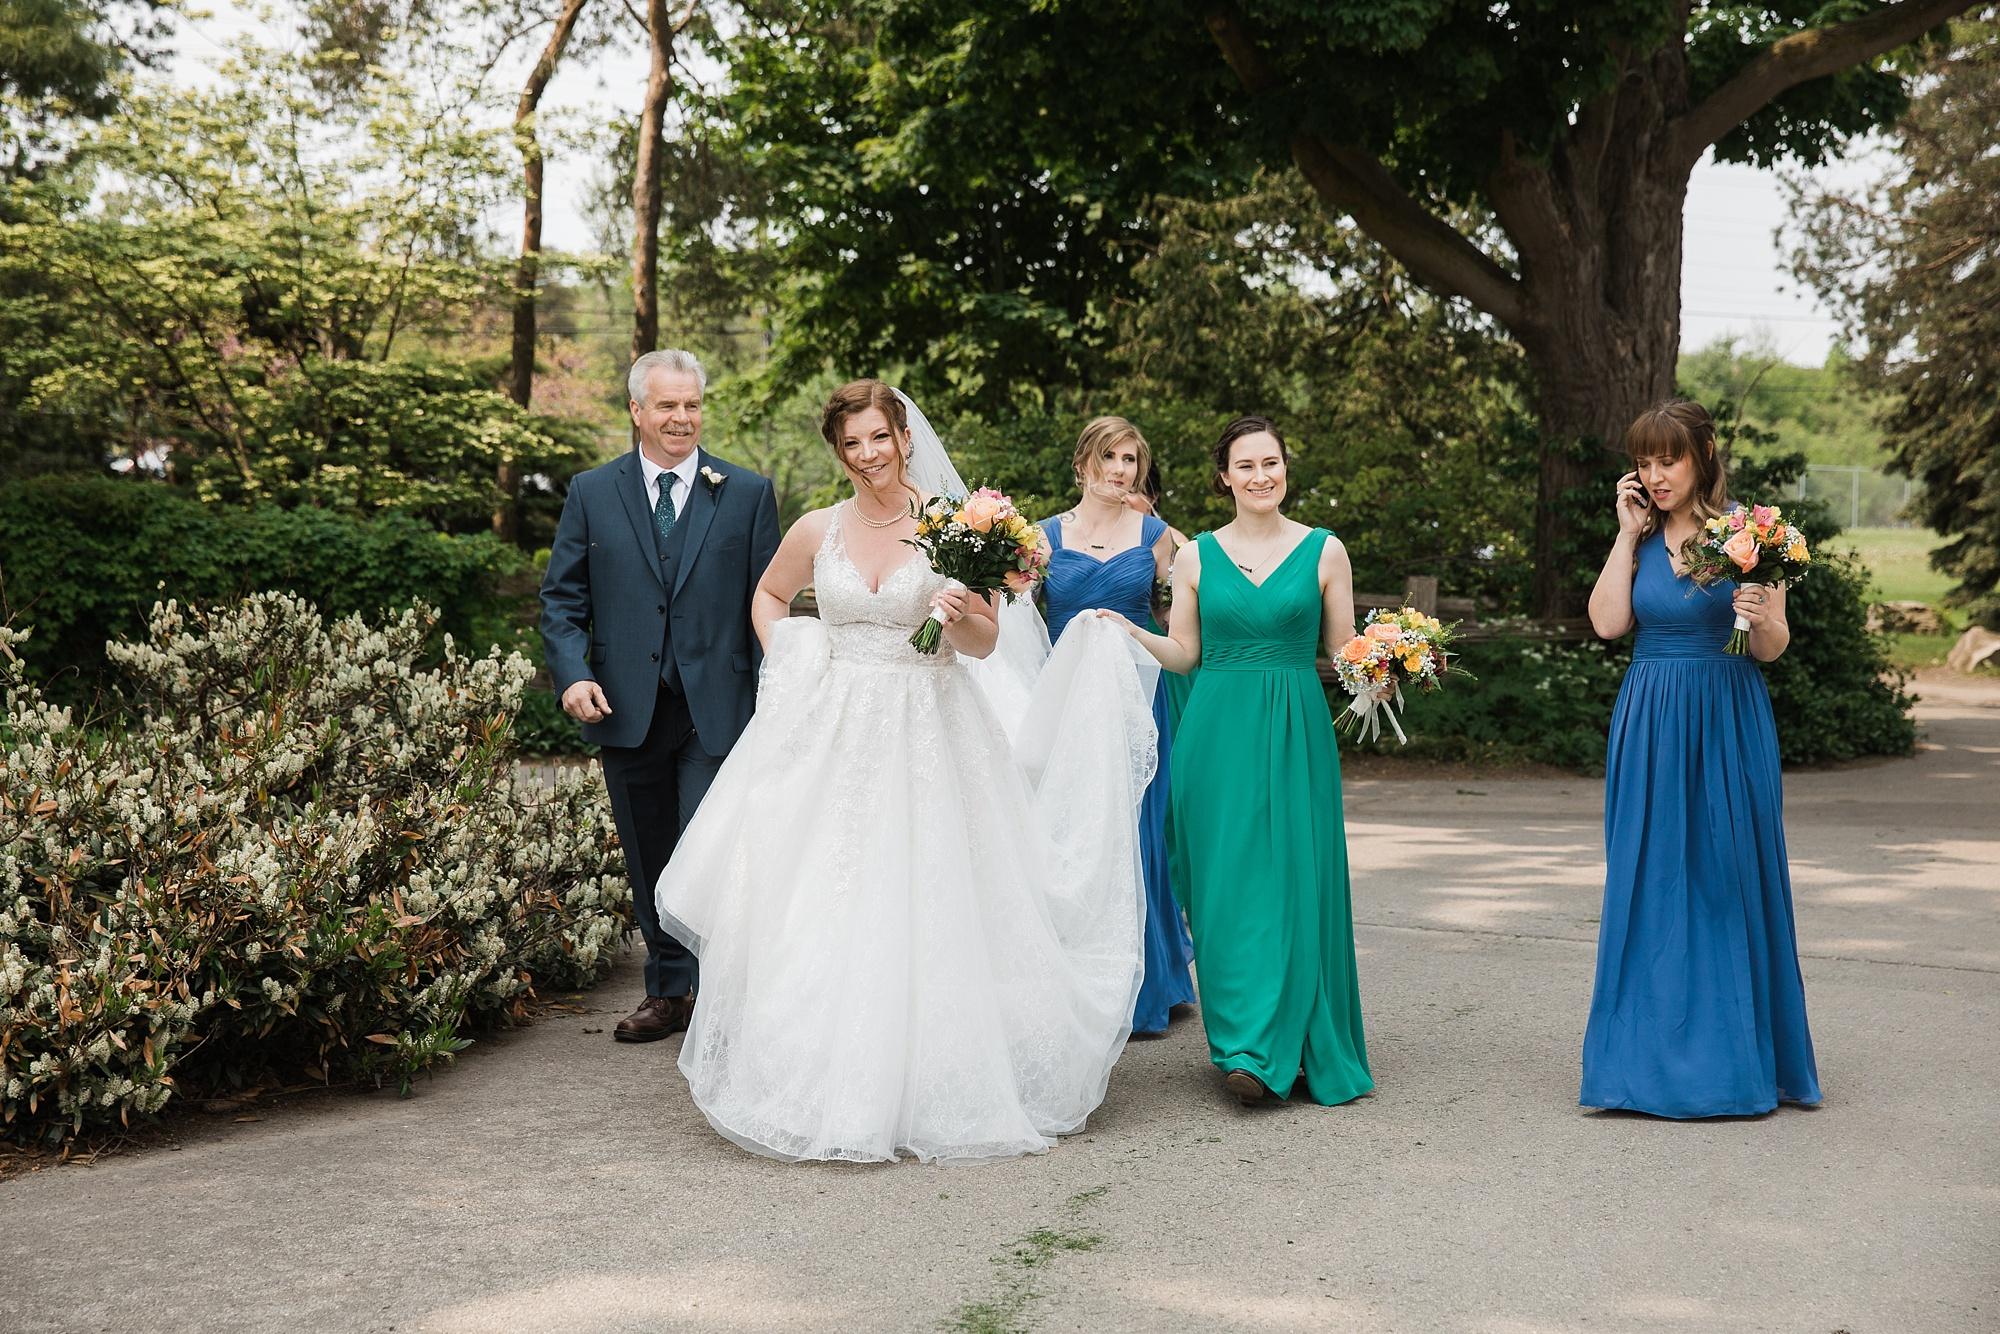 niagarafalls-weddingphotography_0013.jpg